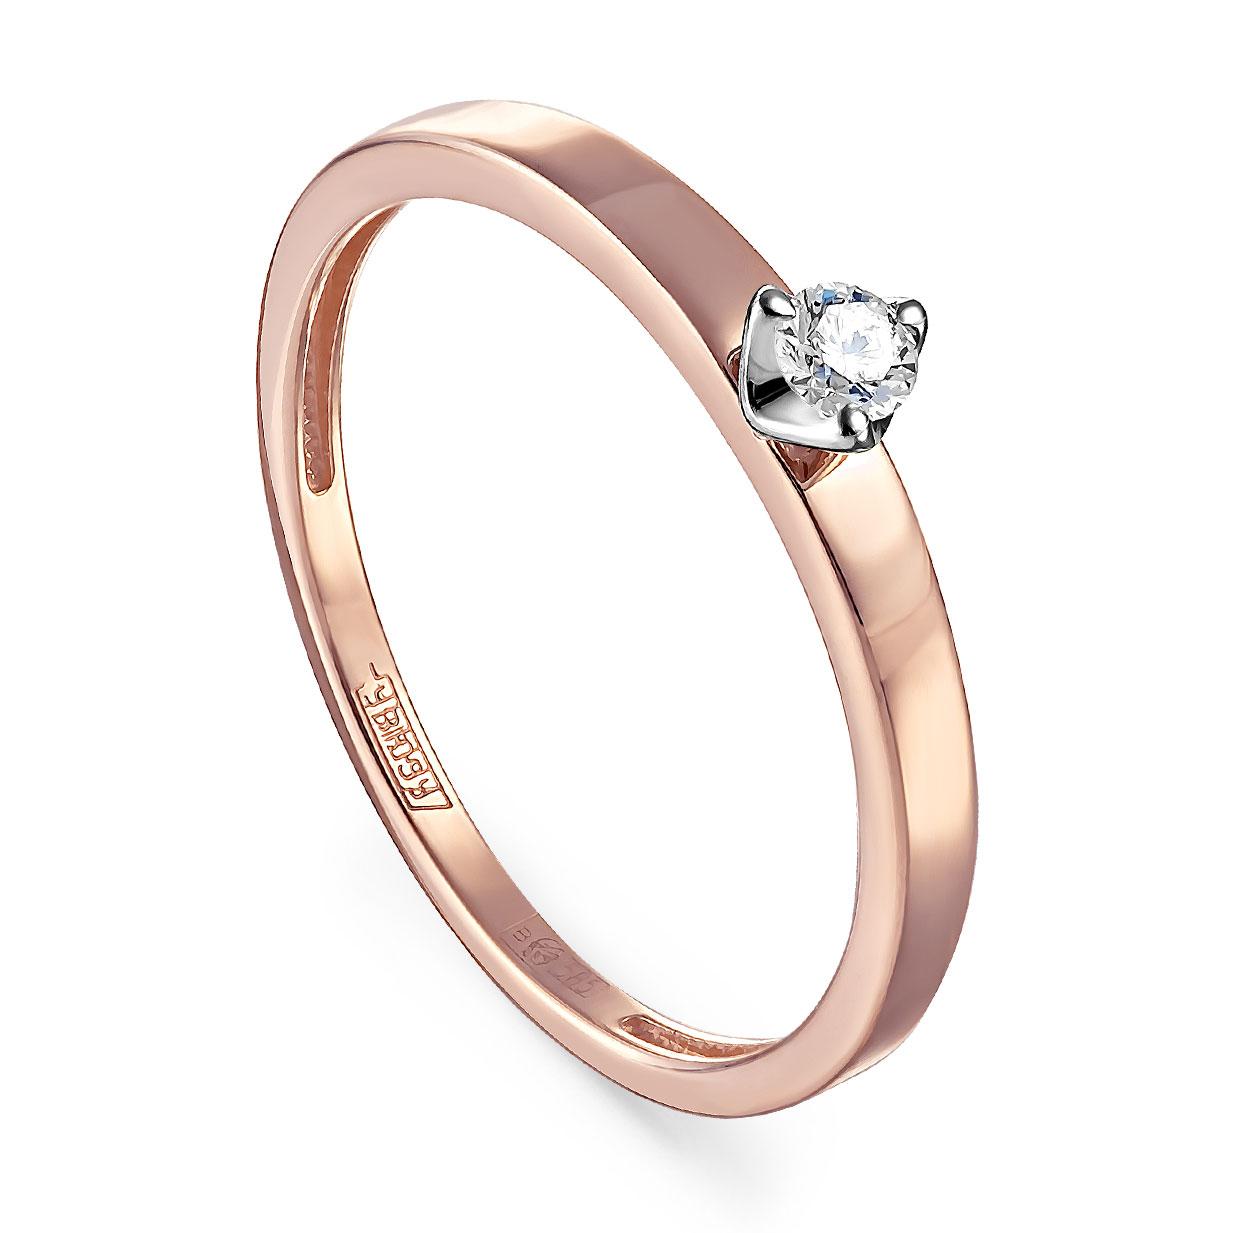 Золотое кольцо Бриллиант арт. 11-01208-1000 11-01208-1000